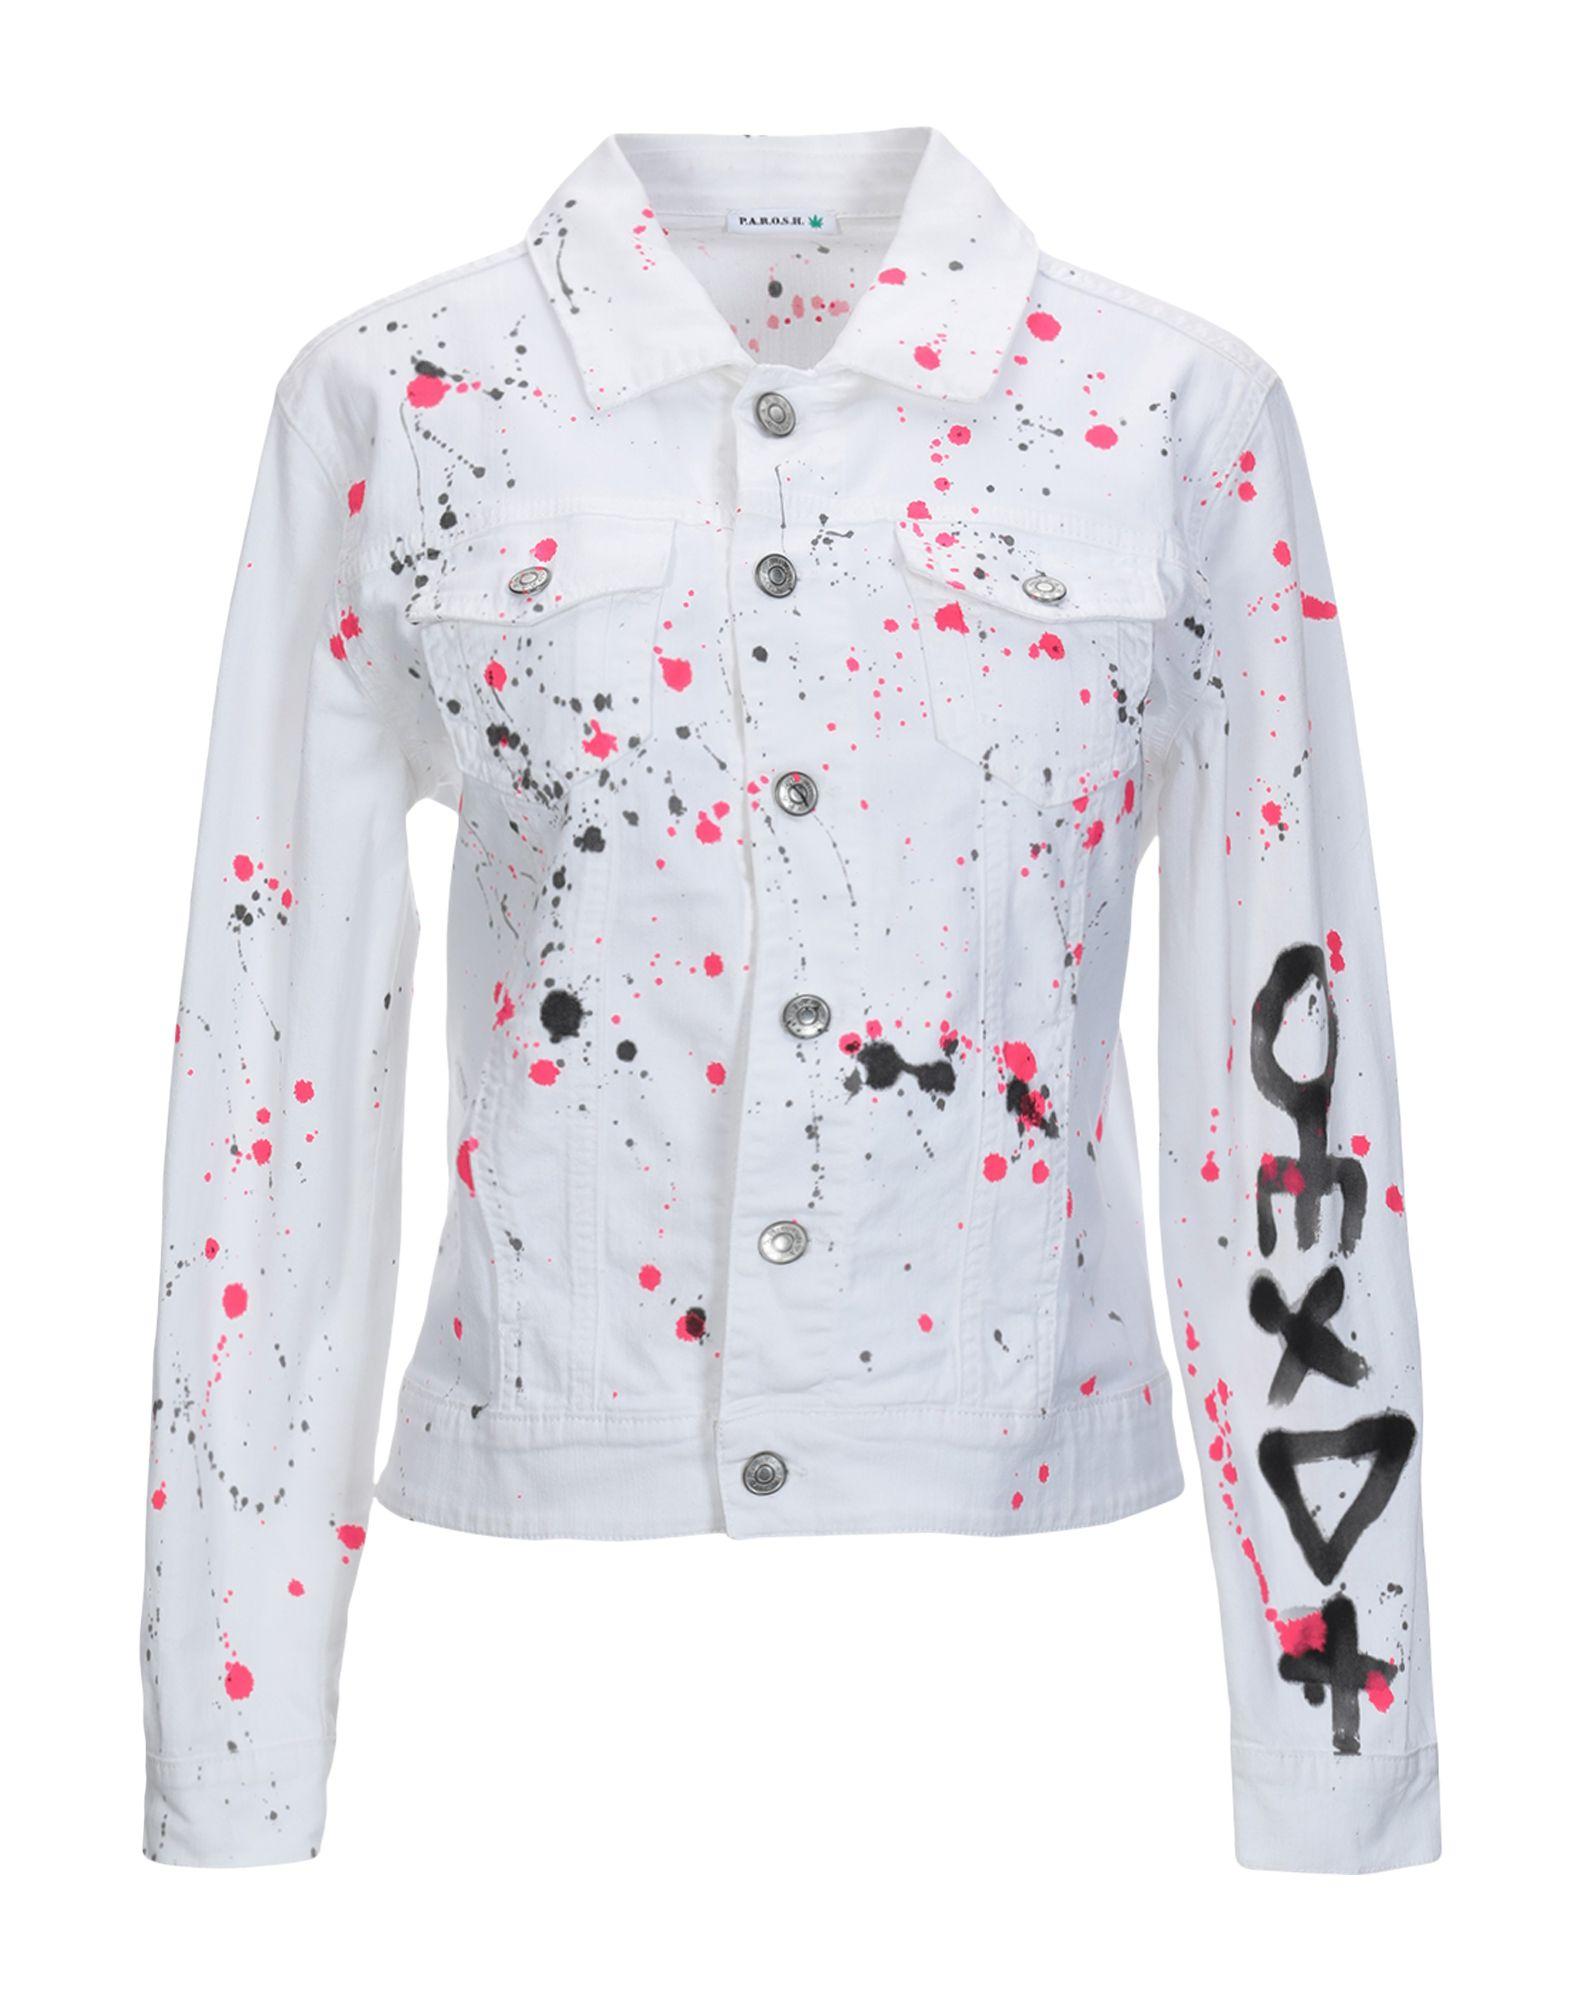 Giubbotto Giubbotto Jeans P.A.R.O.S.H. donna - 42708068XK  Förderungen